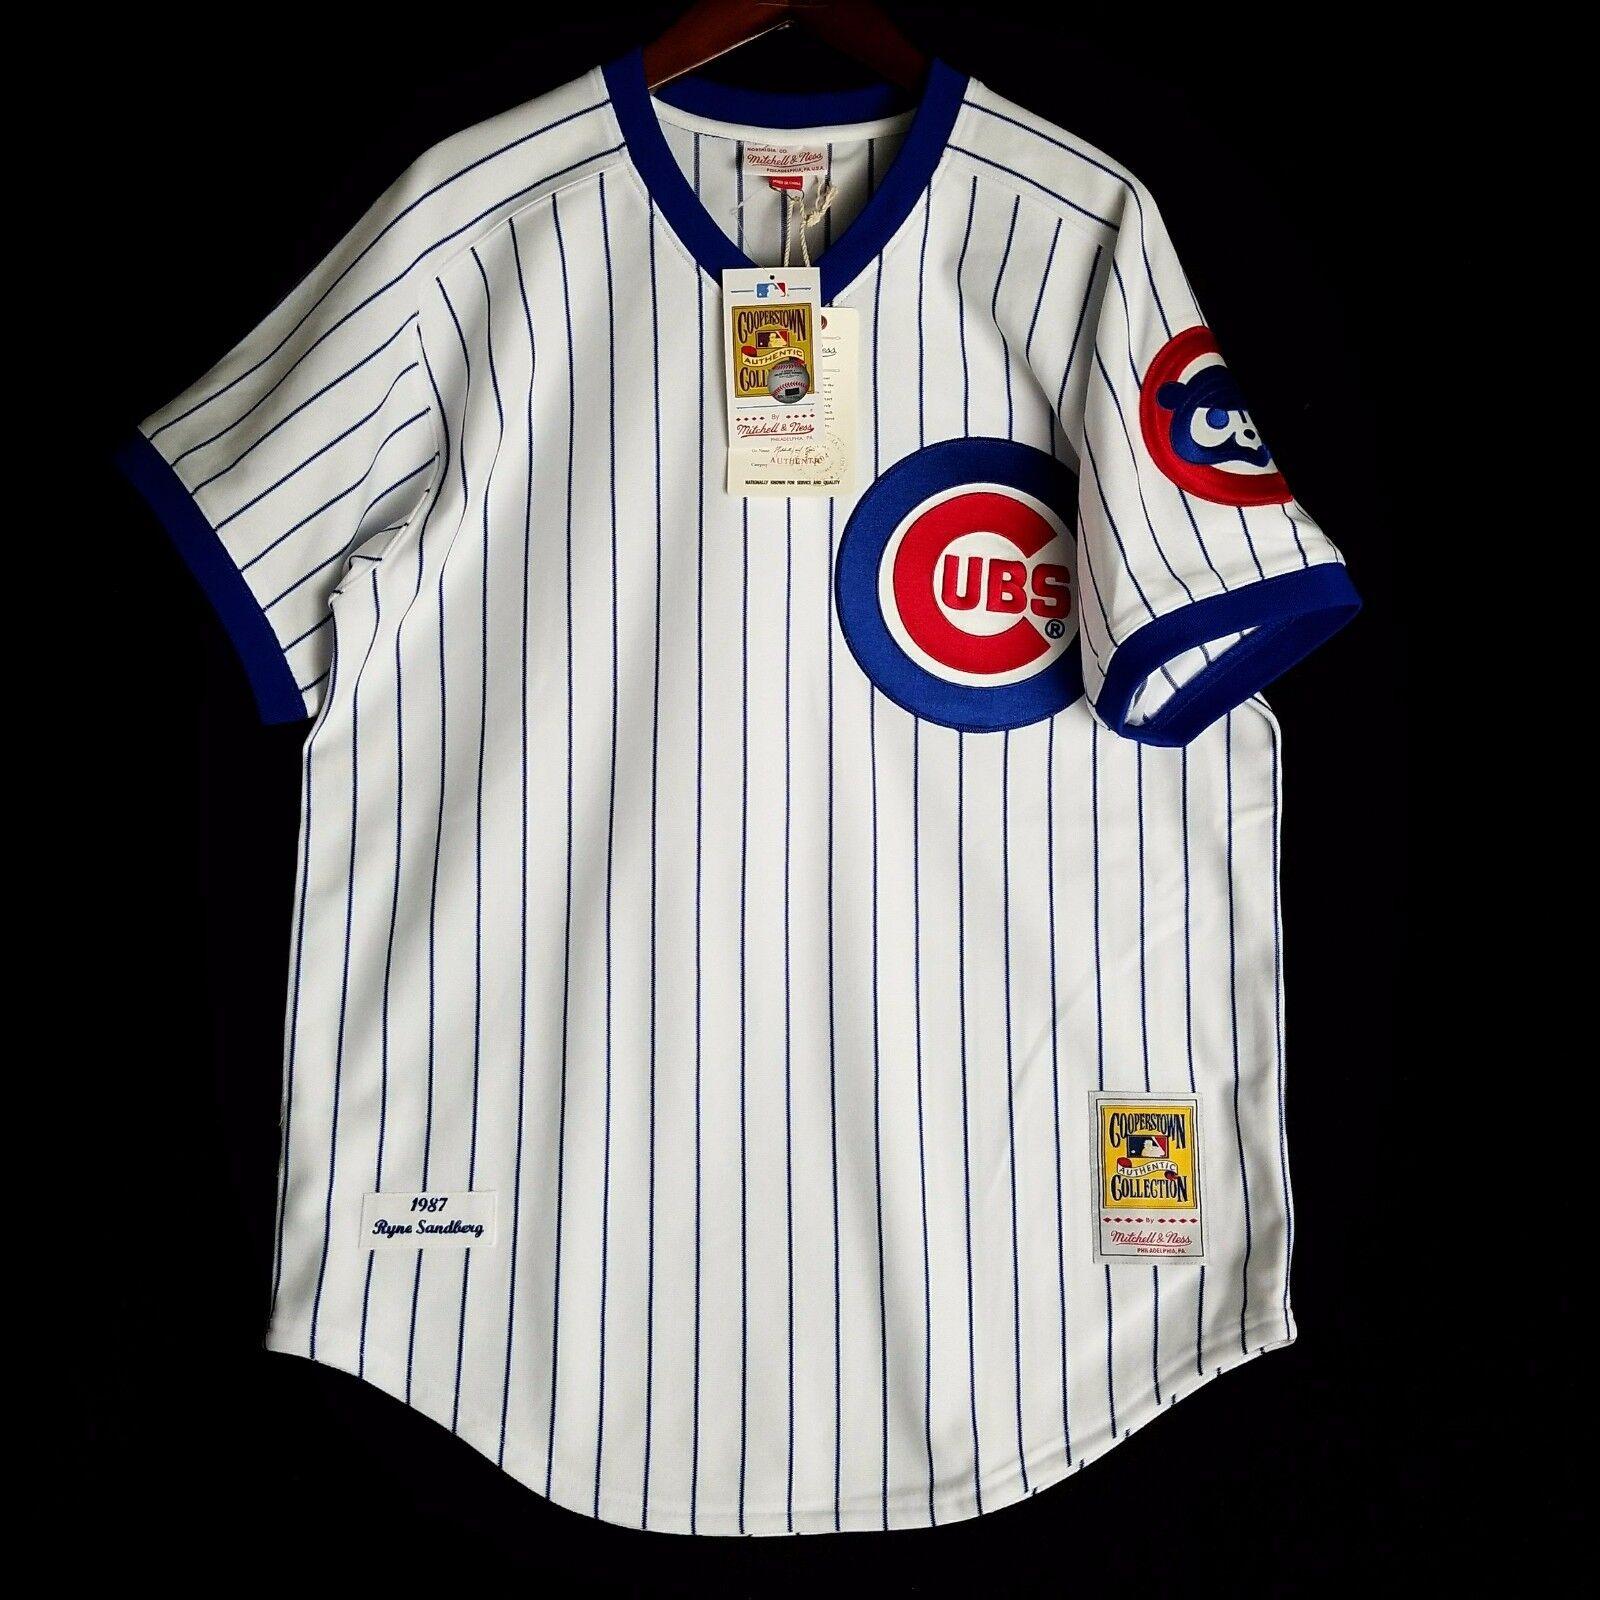 100% Authentisch Minifigur Ryne Sandberg Mitchell Ness 87 Cubs MLB Trikot Größe